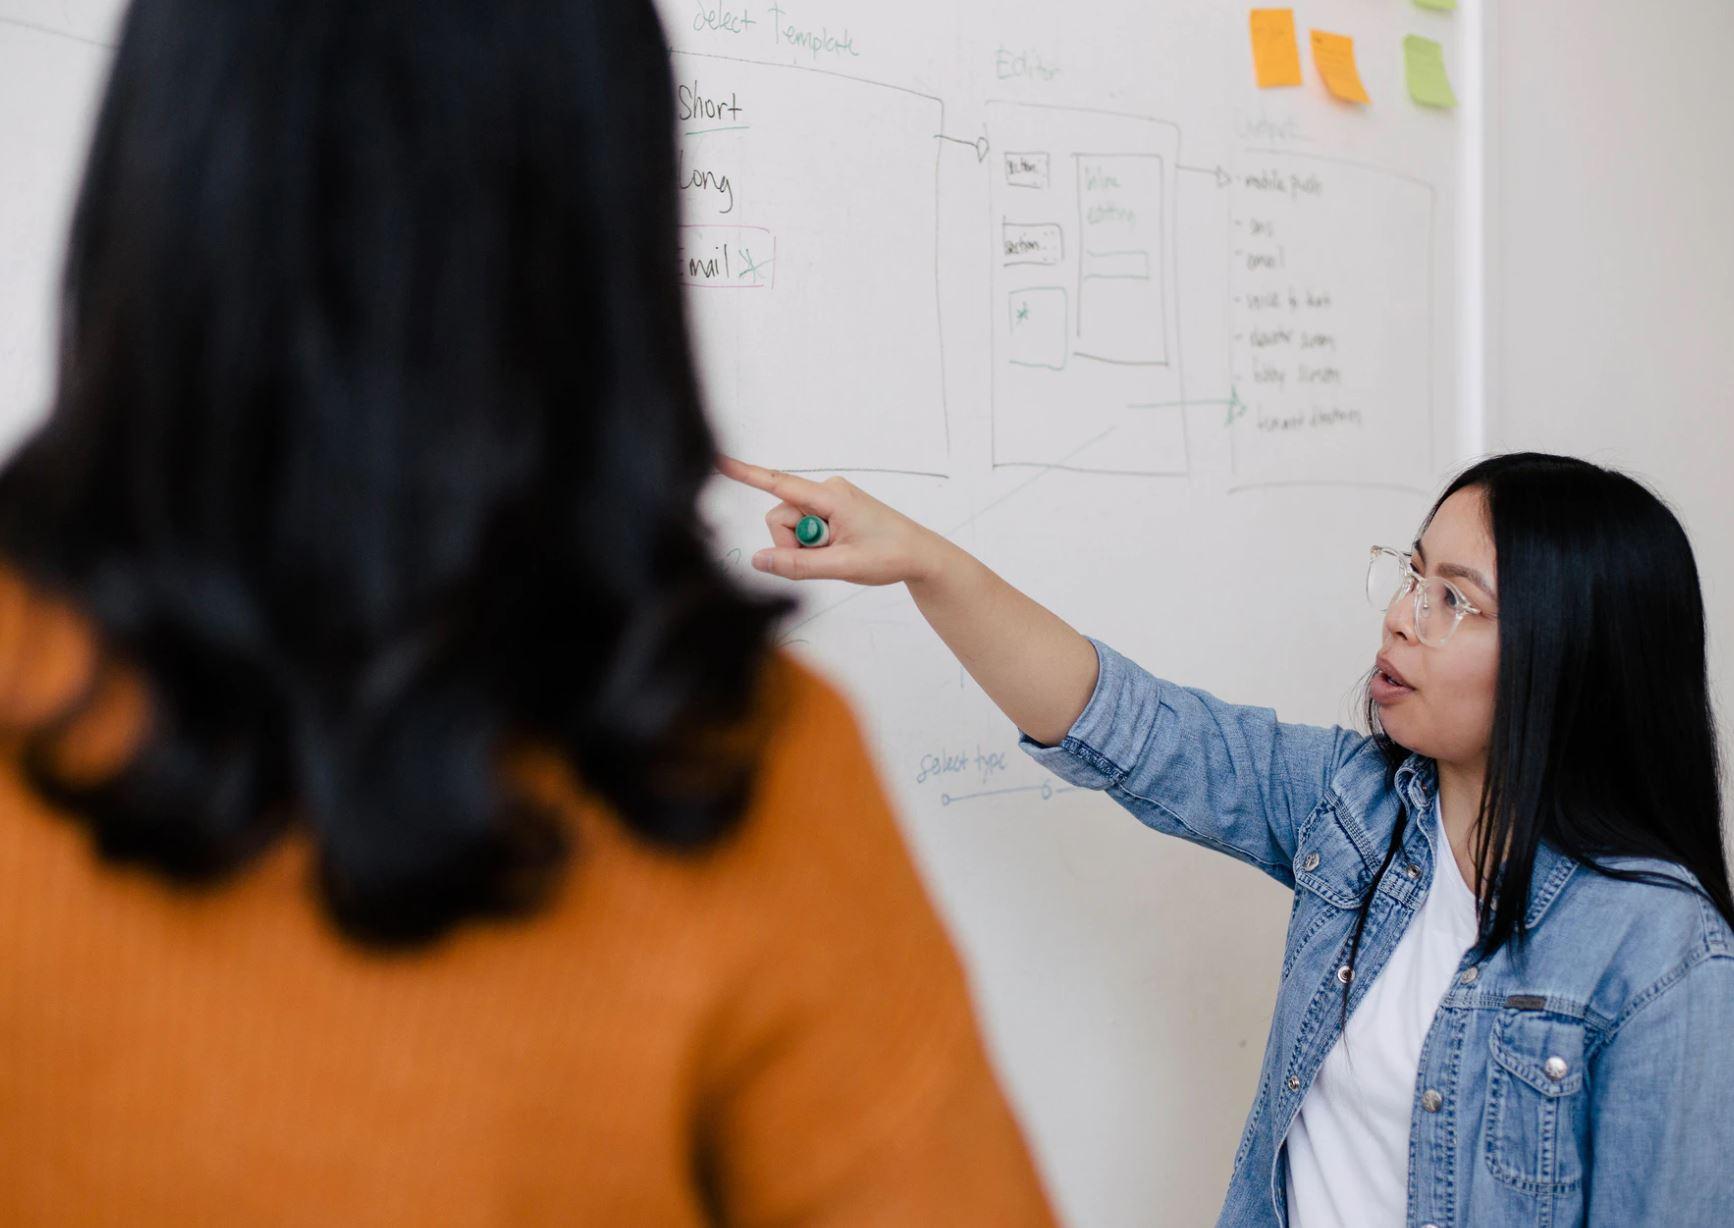 A teacher in a classroom | You X Ventures/Unsplash